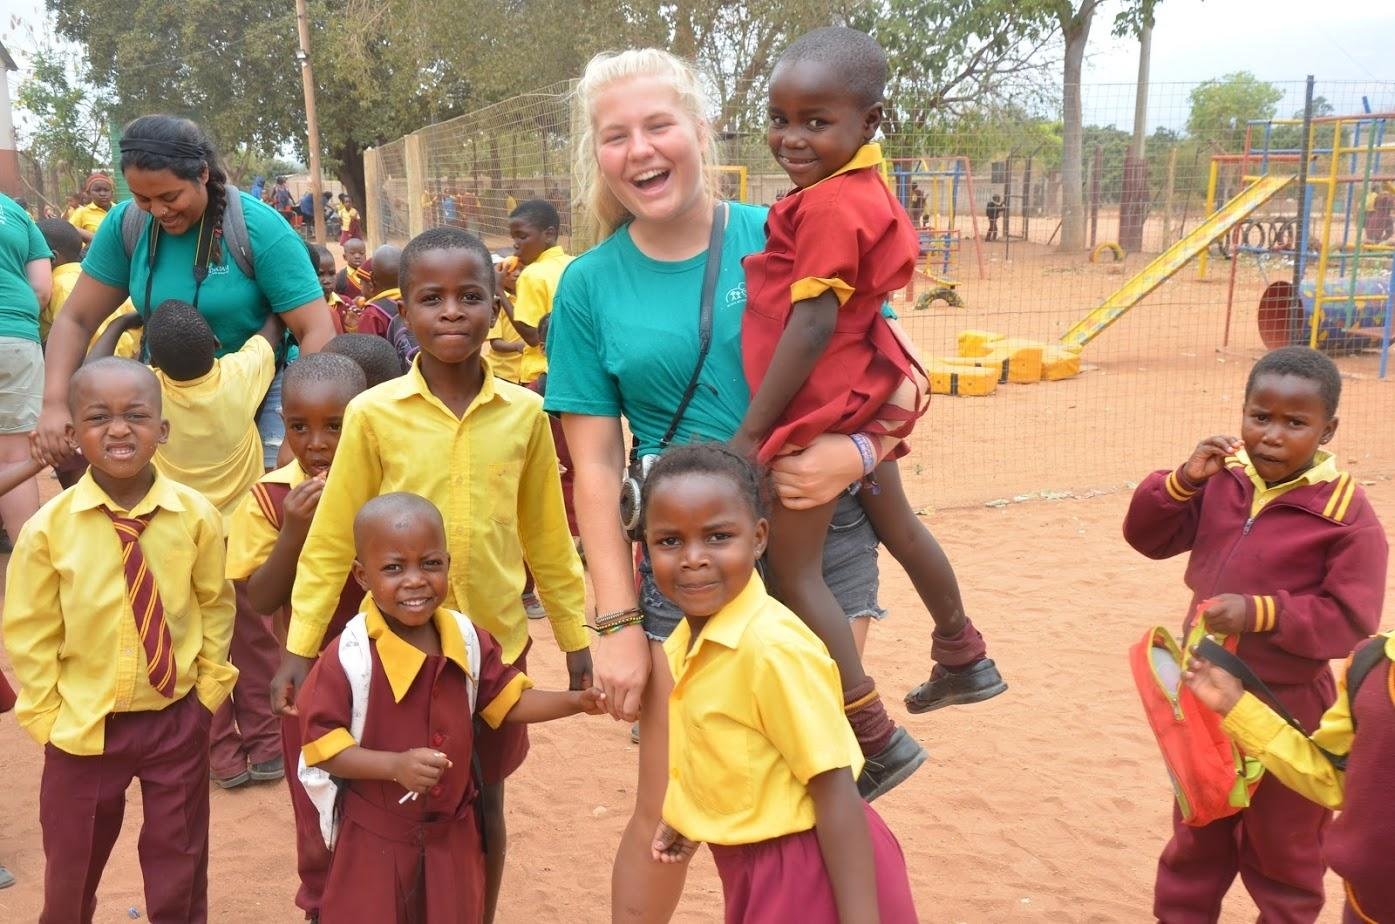 Providing Outreach to Local Communities